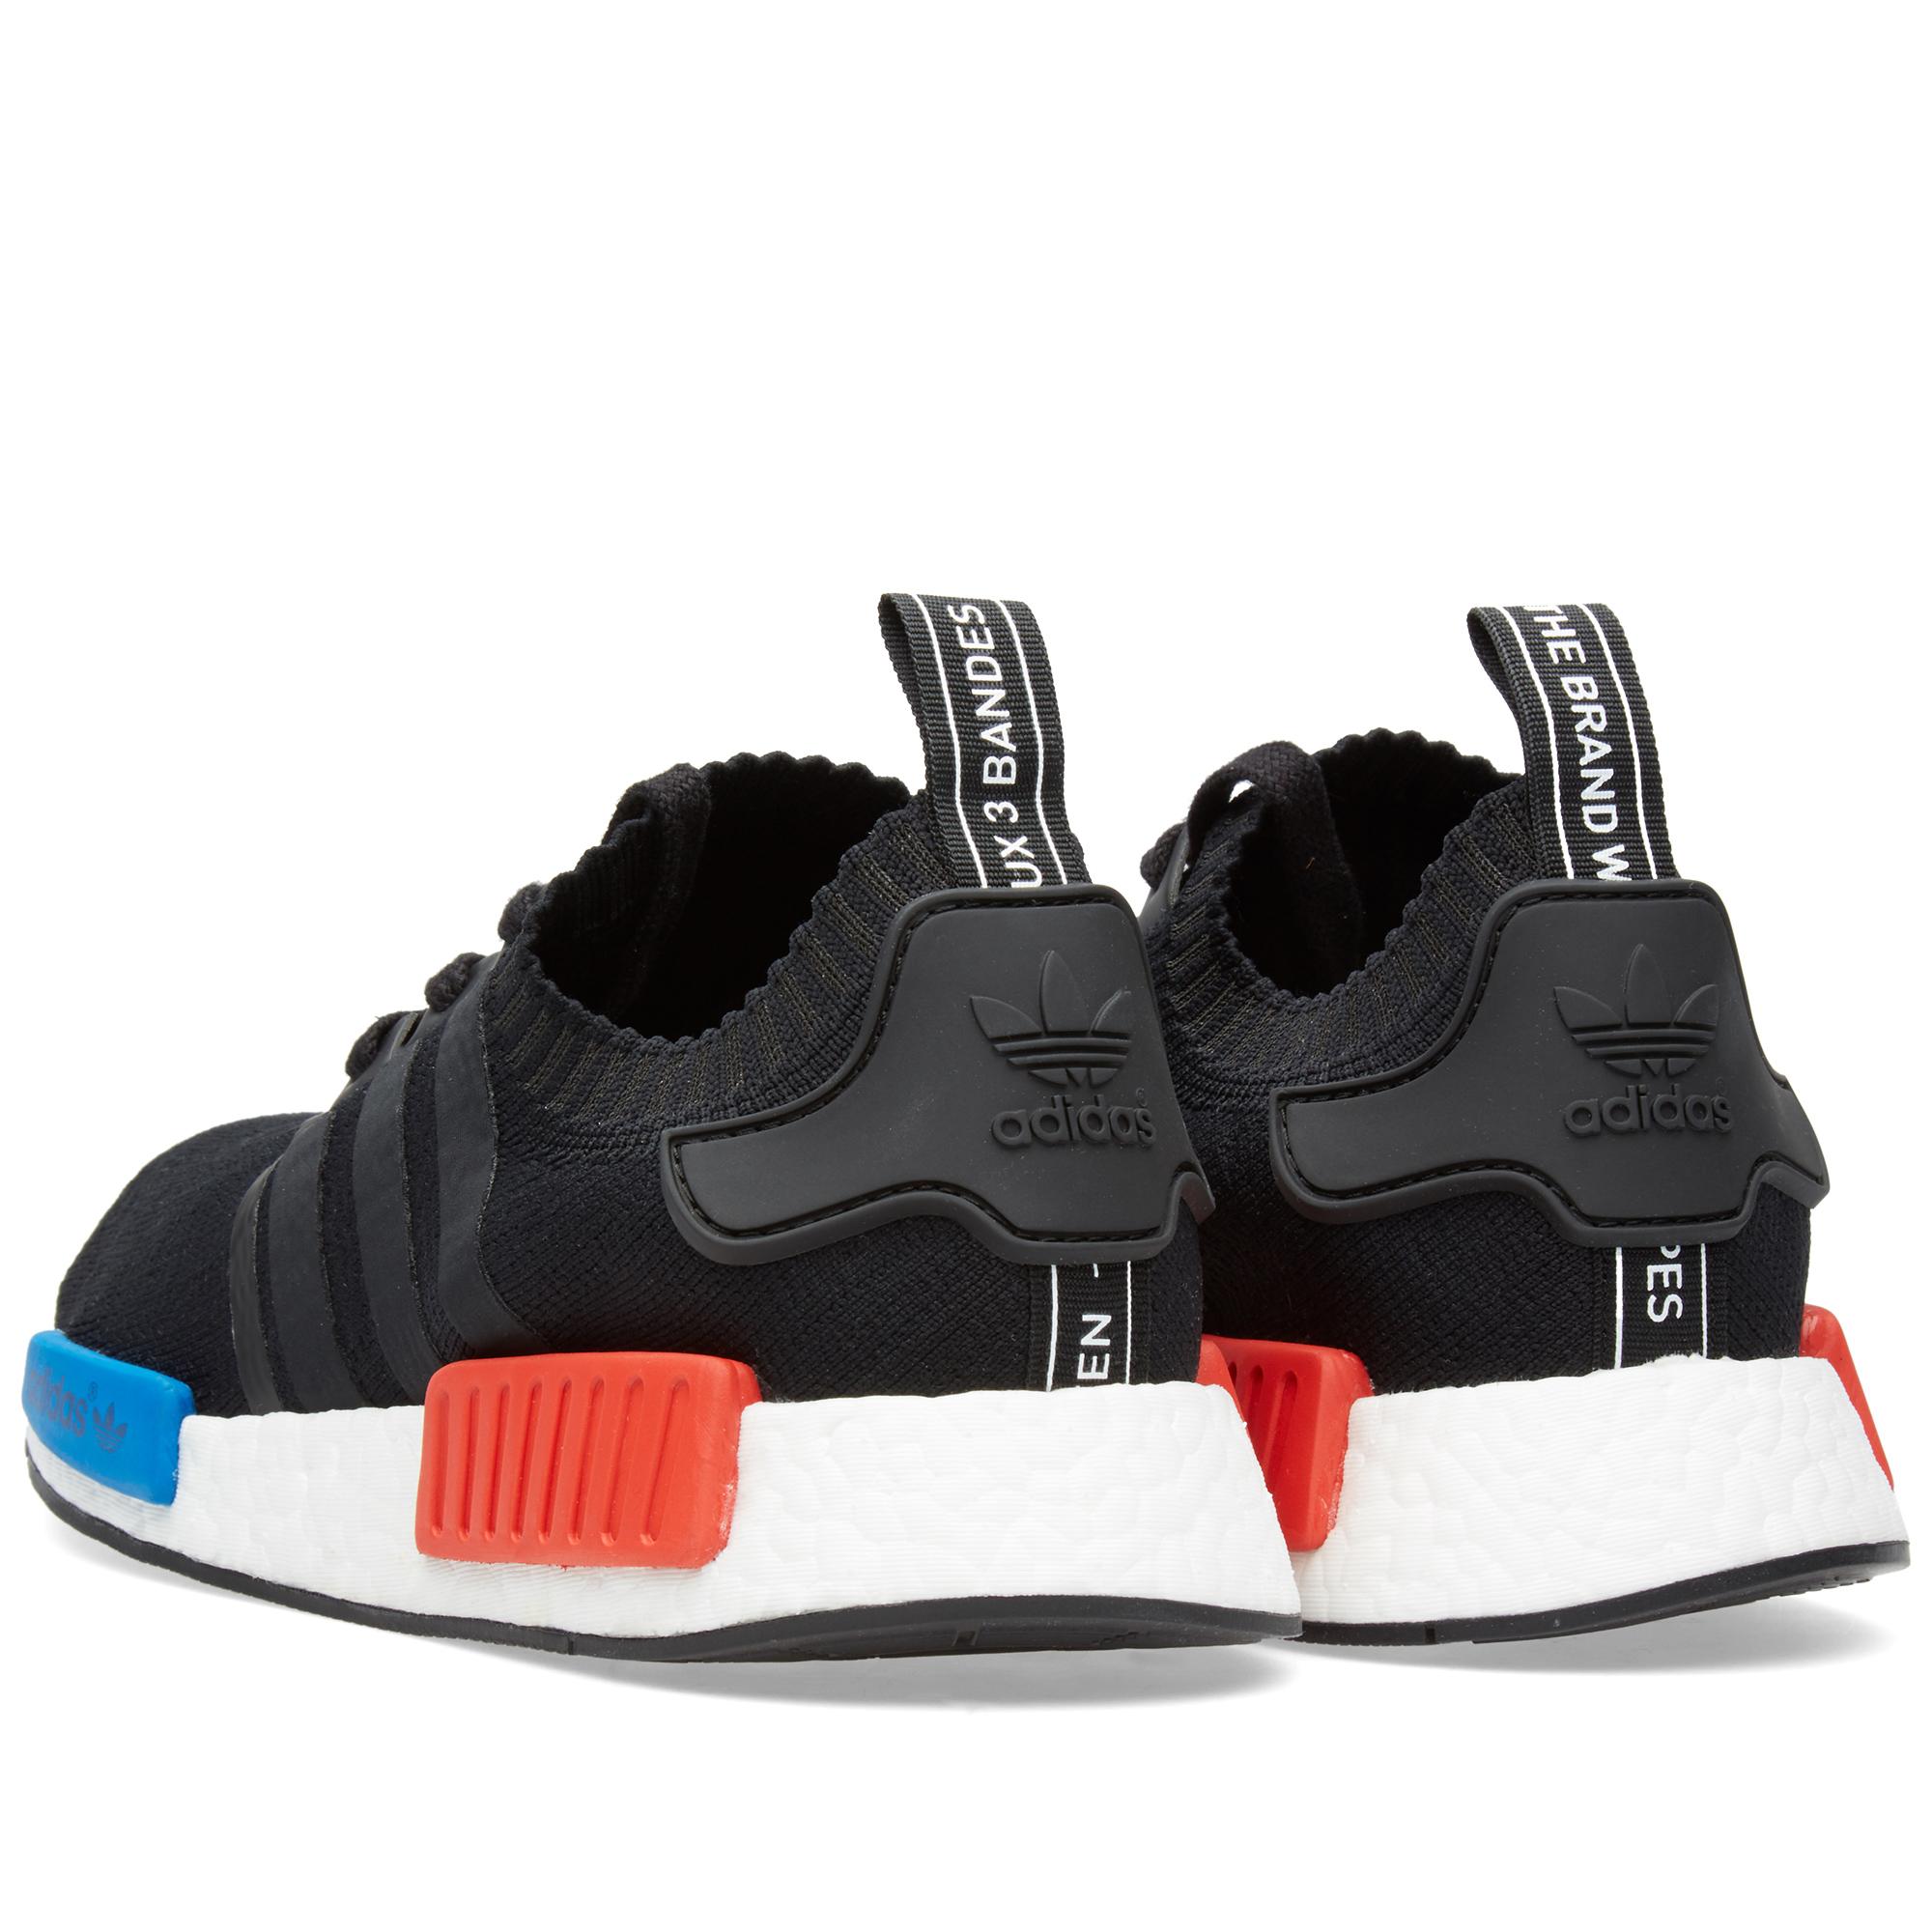 Adidas Nmd Black Red Tabs